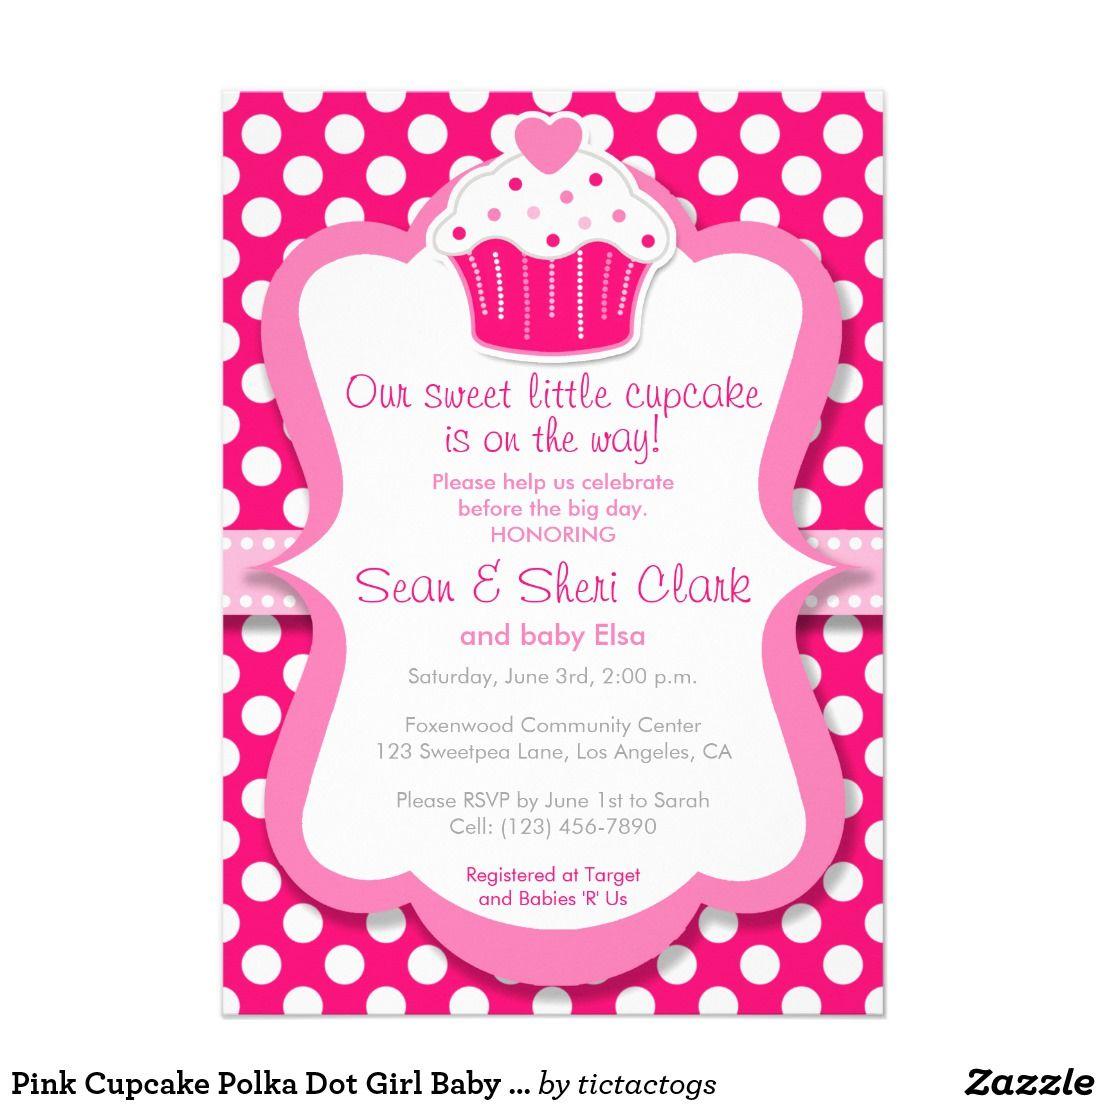 Pink Cupcake Polka Dot Girl Baby Shower Invitation Express your love ...